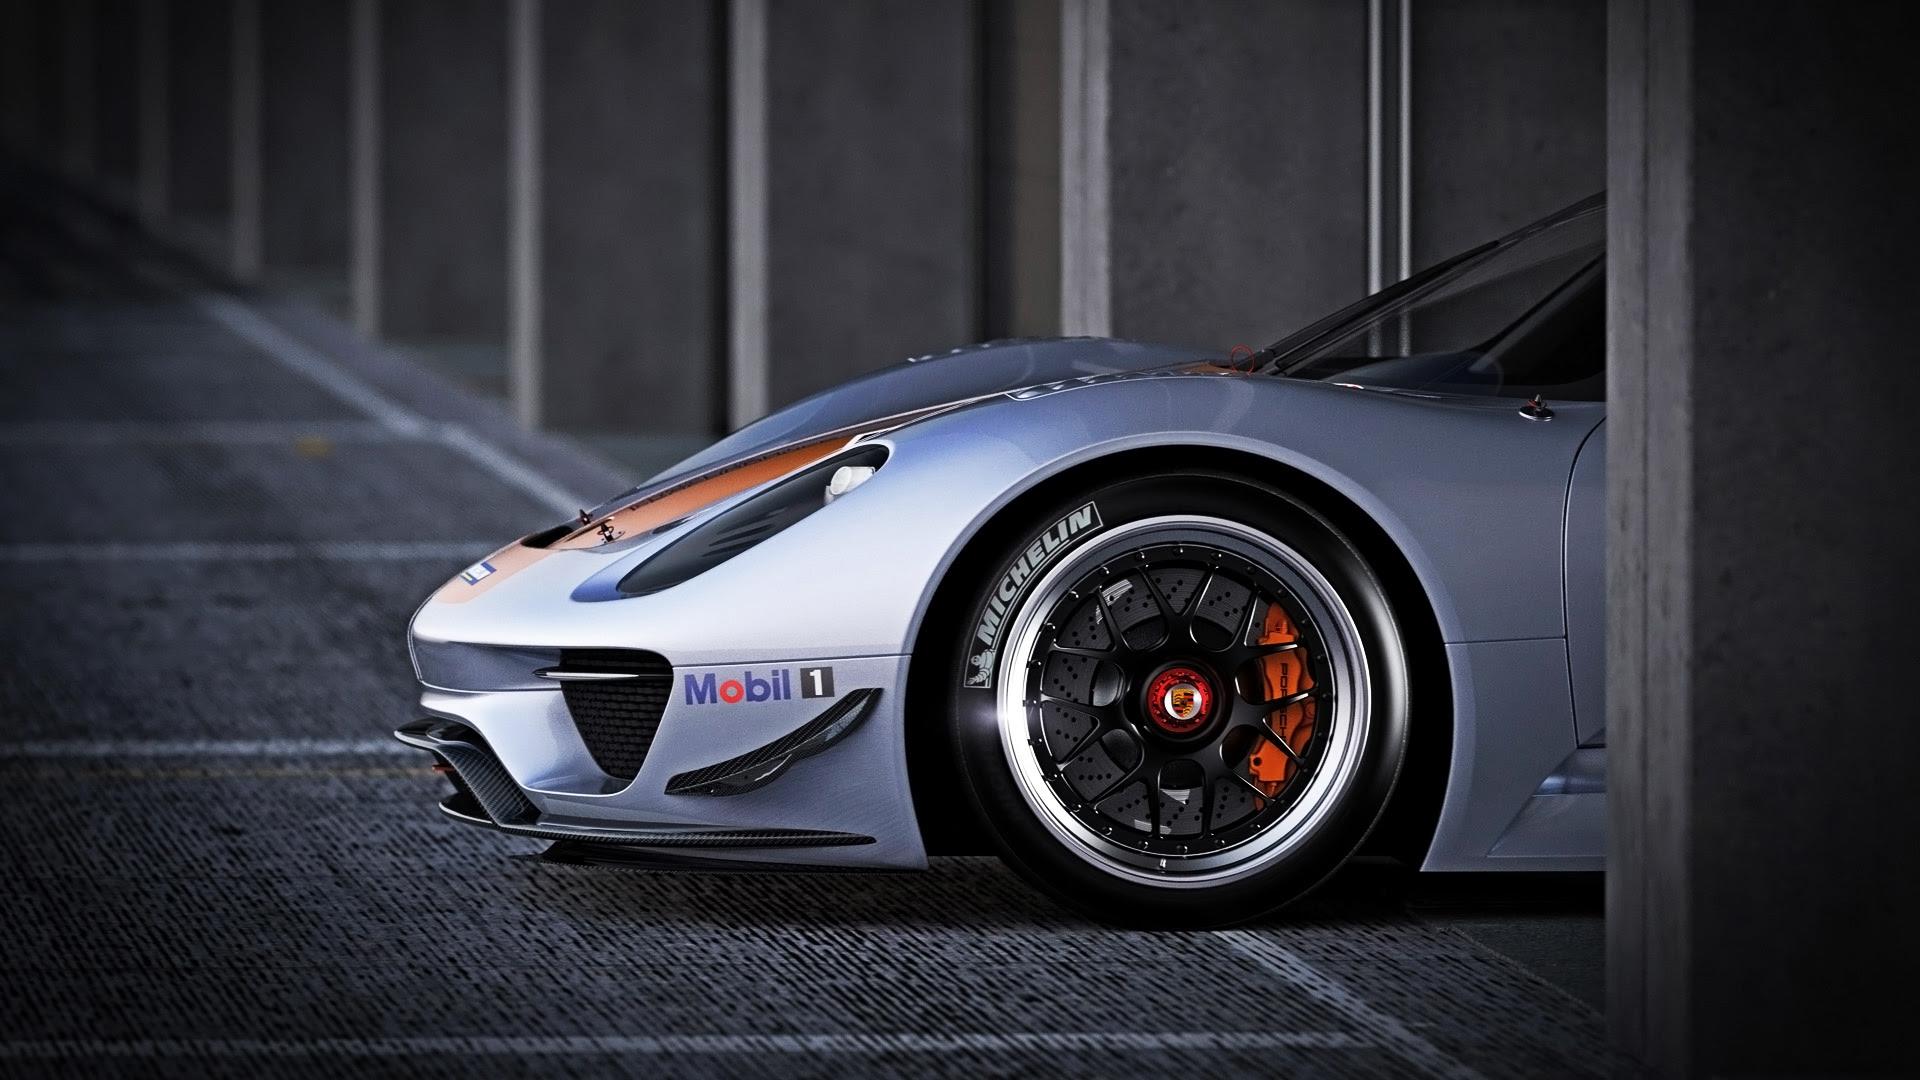 Porsche HD Wallpapers 1080p - WallpaperSafari